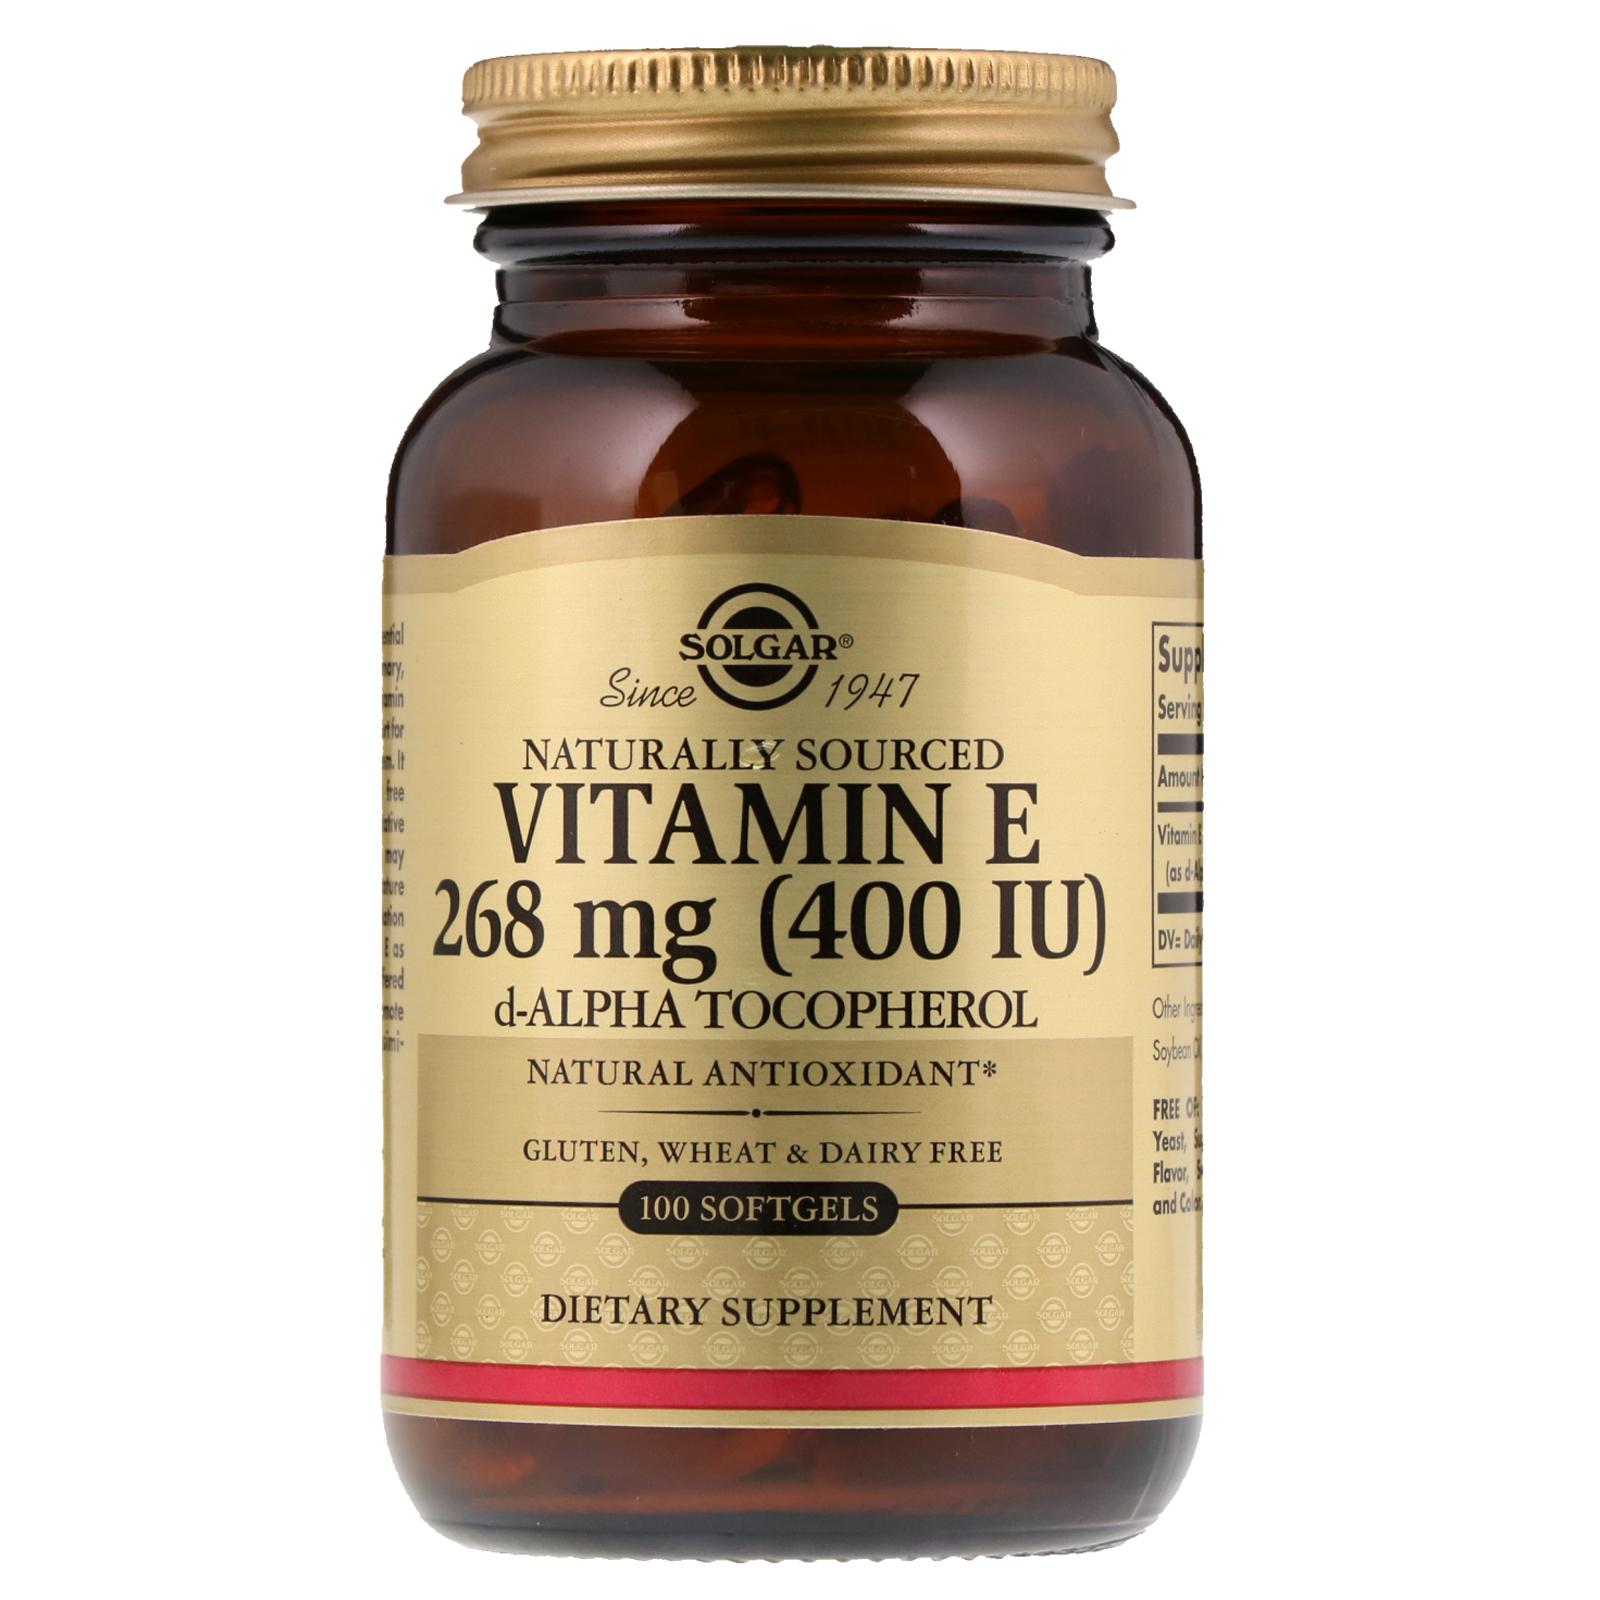 Solgar Naturally Sourced Vitamin E 400 Iu 100 Softgels Iherb Com